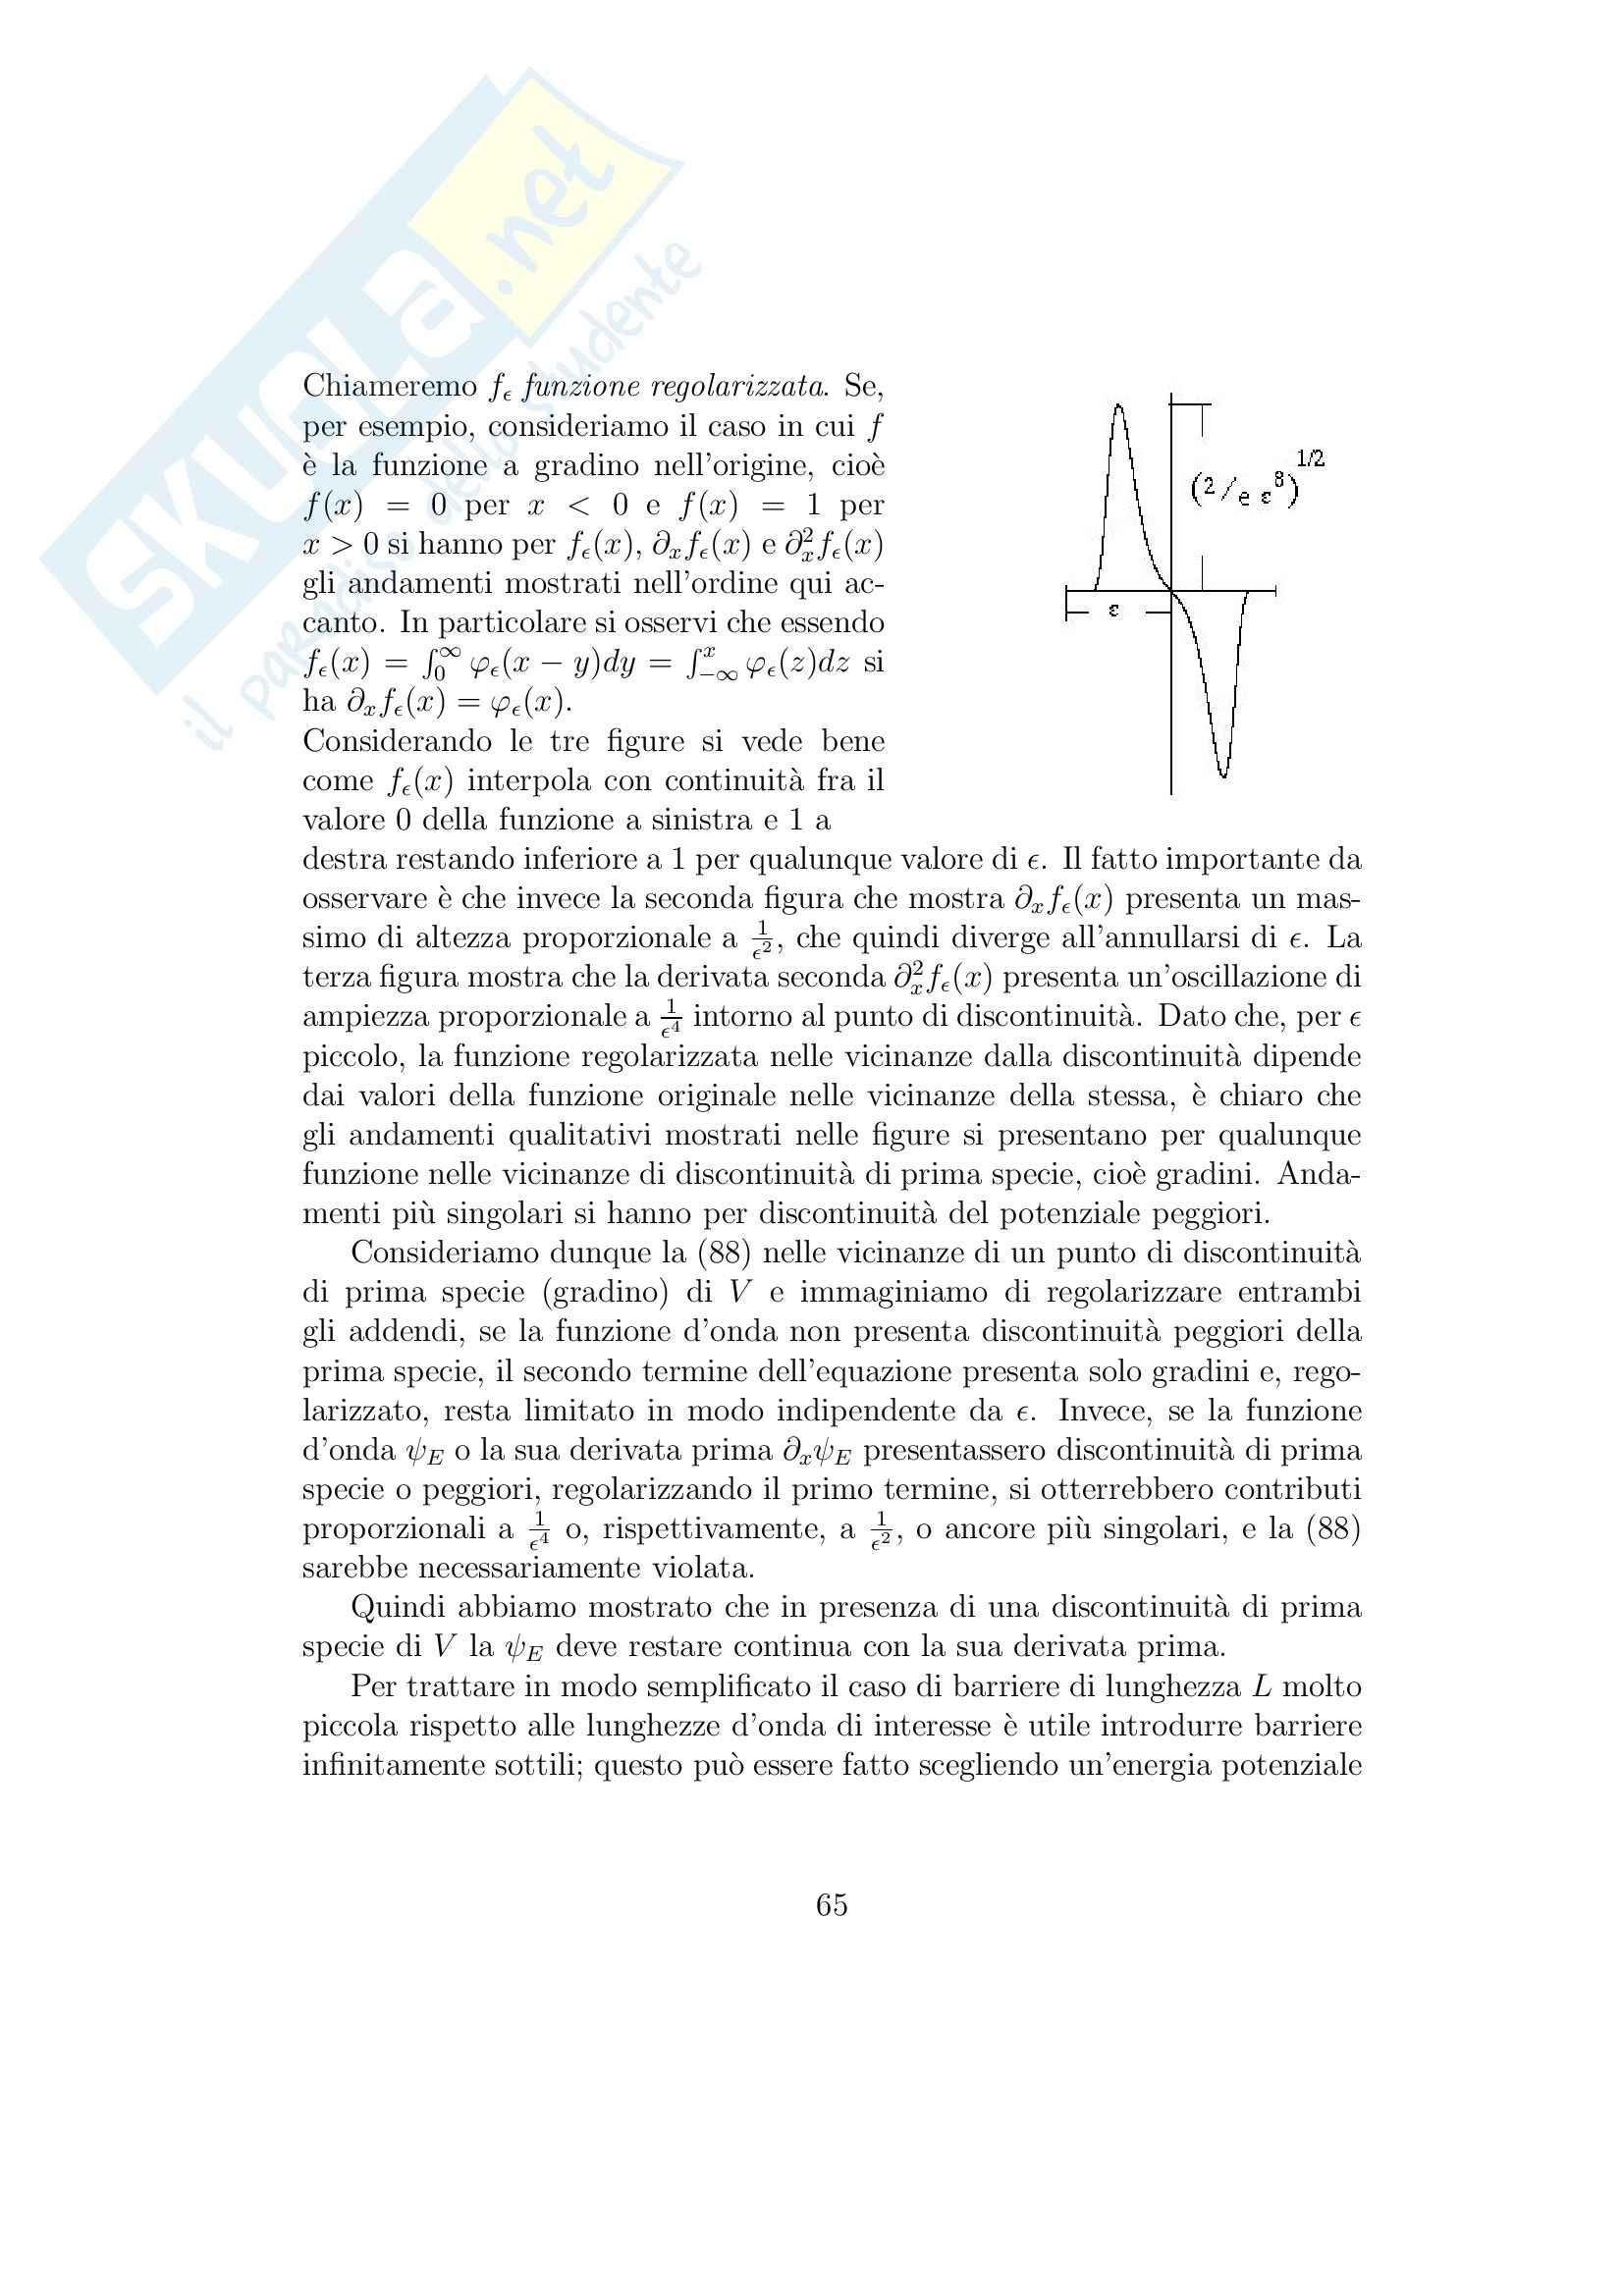 Fisica Moderna - Appunti Pag. 66